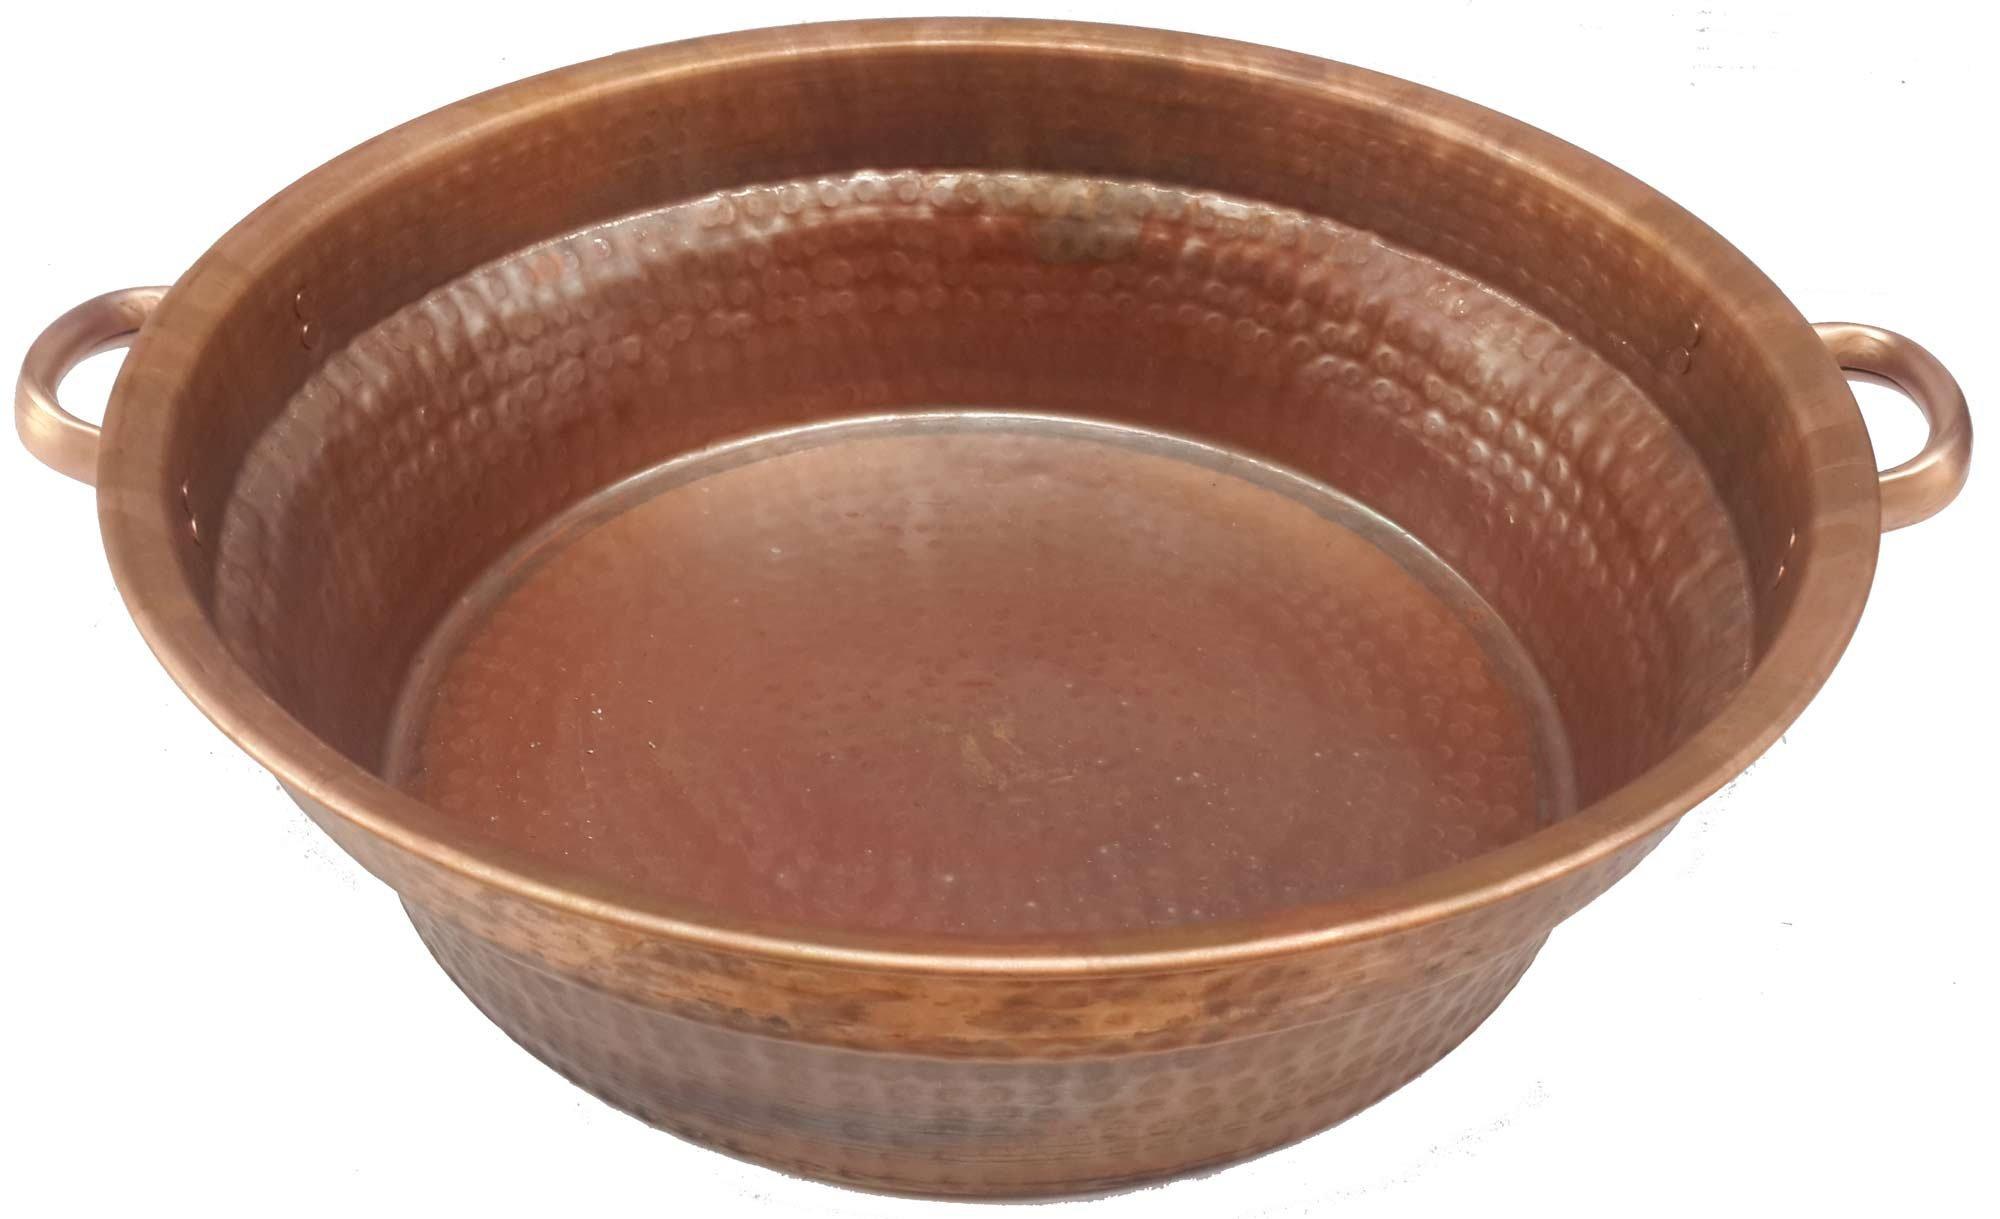 Egypt gift shops 21'' Large Fire Burnt Foot Massage Bath Bucket Handles Pedicure Spa Styling Salon Bowl 14'' Bottom